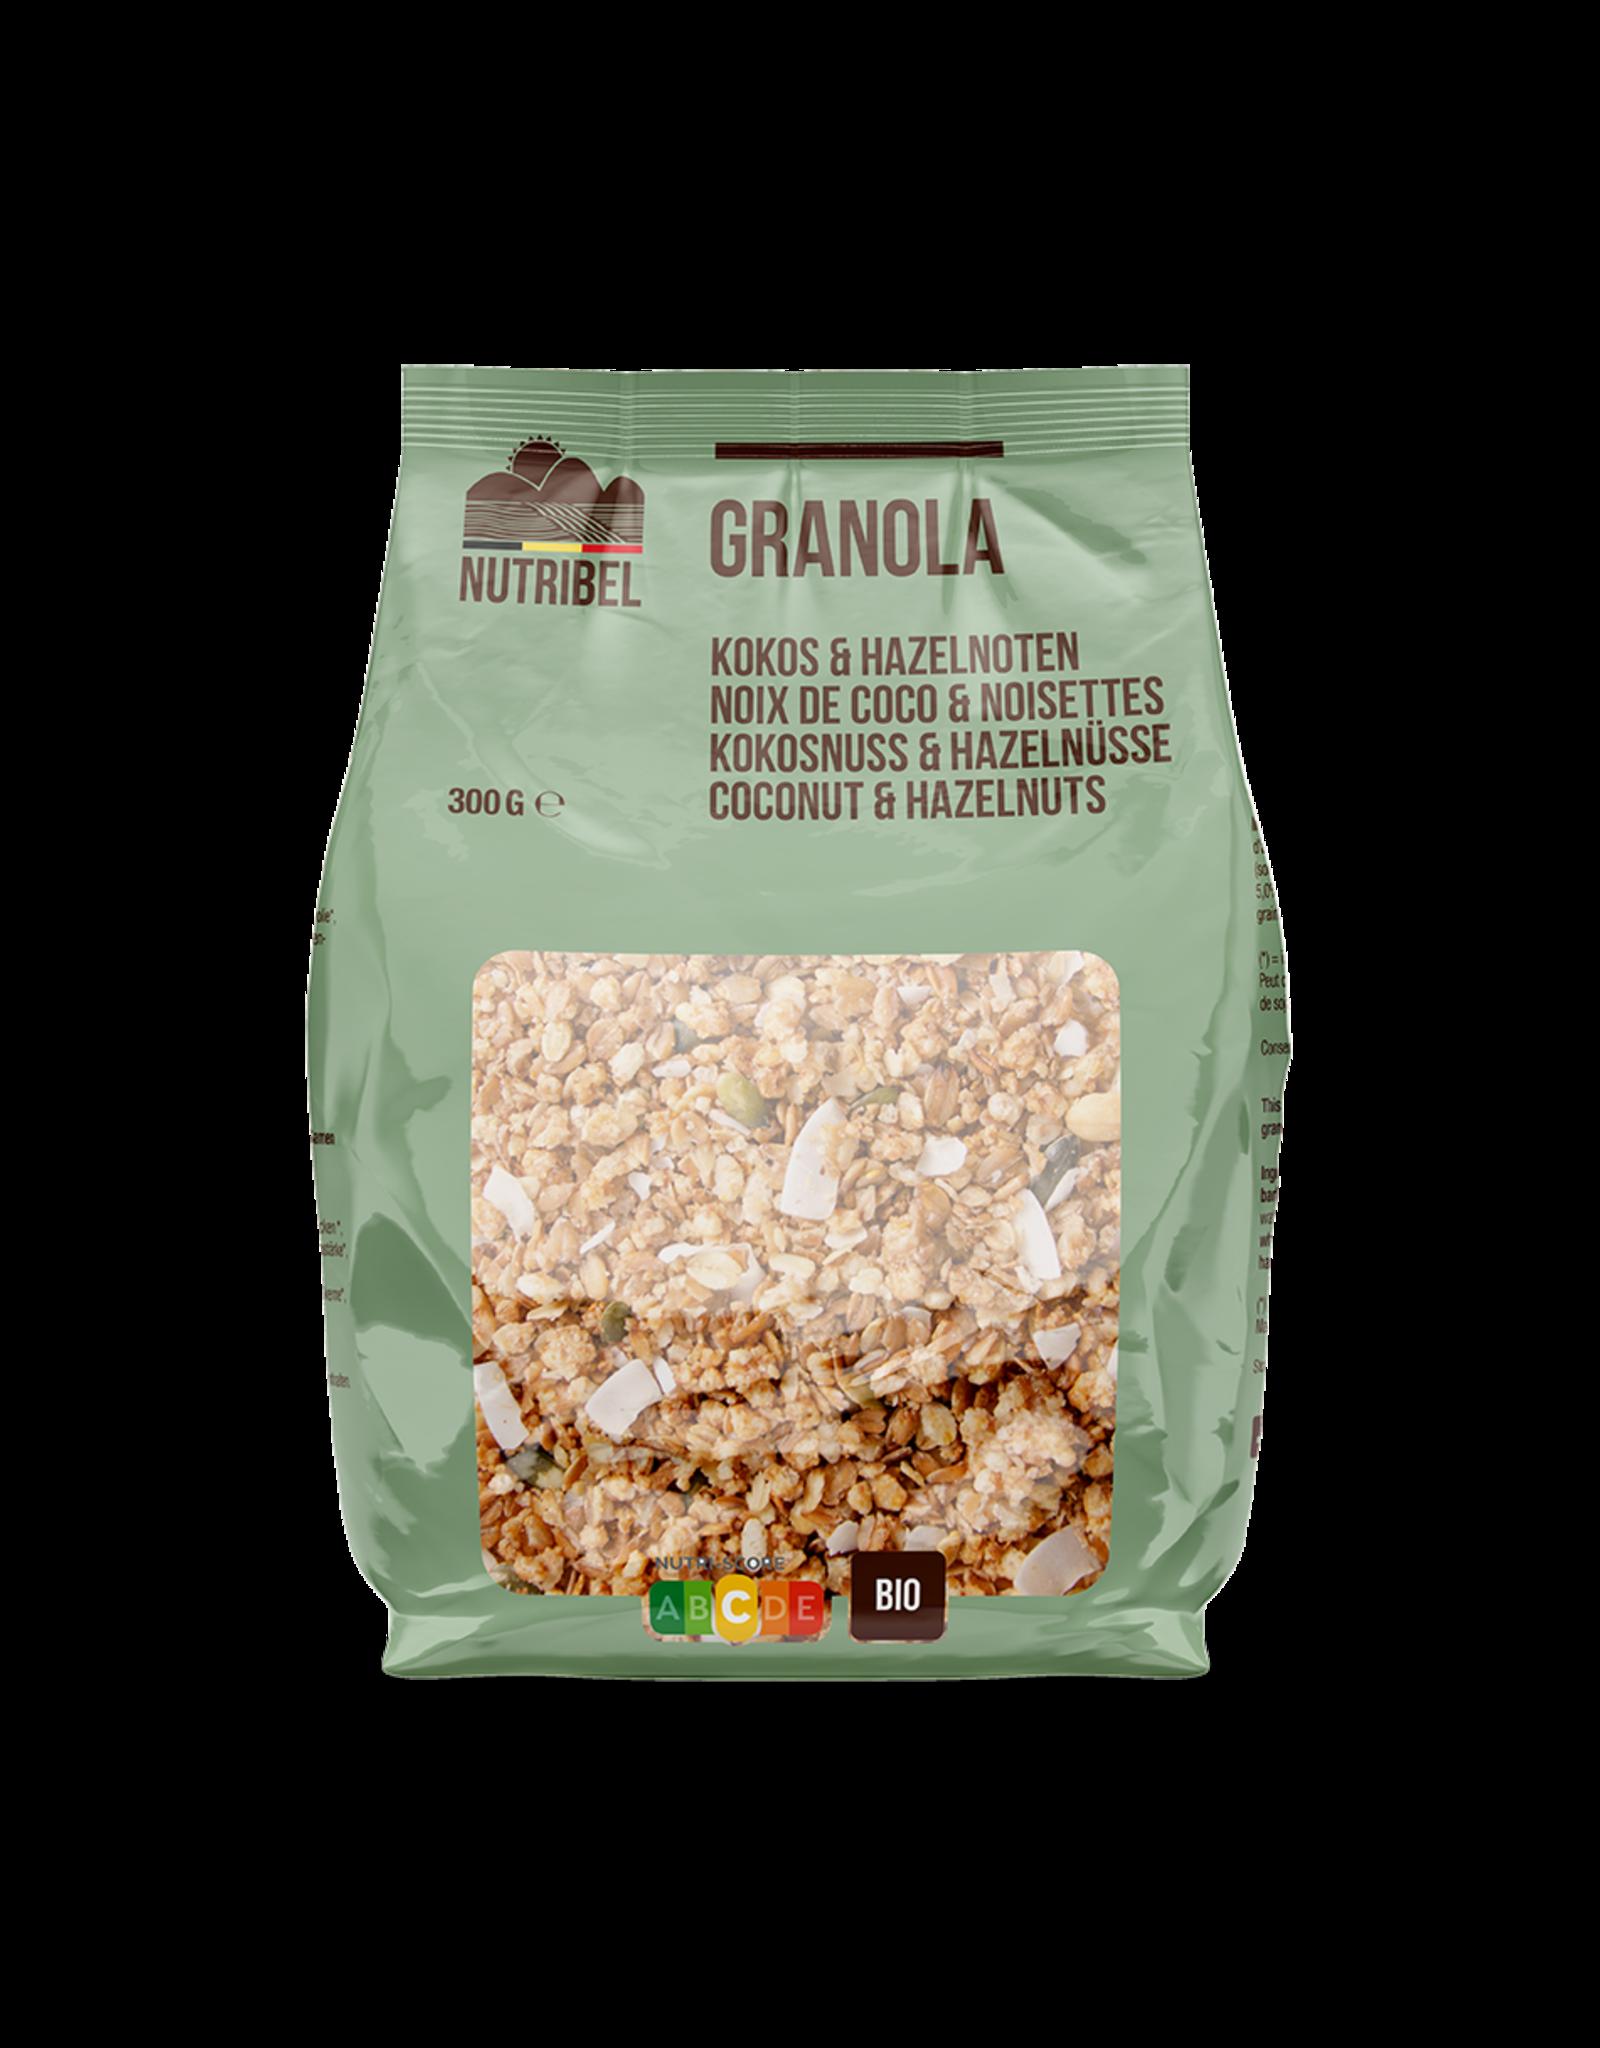 Nutribel Granola coco noisette bio 300g